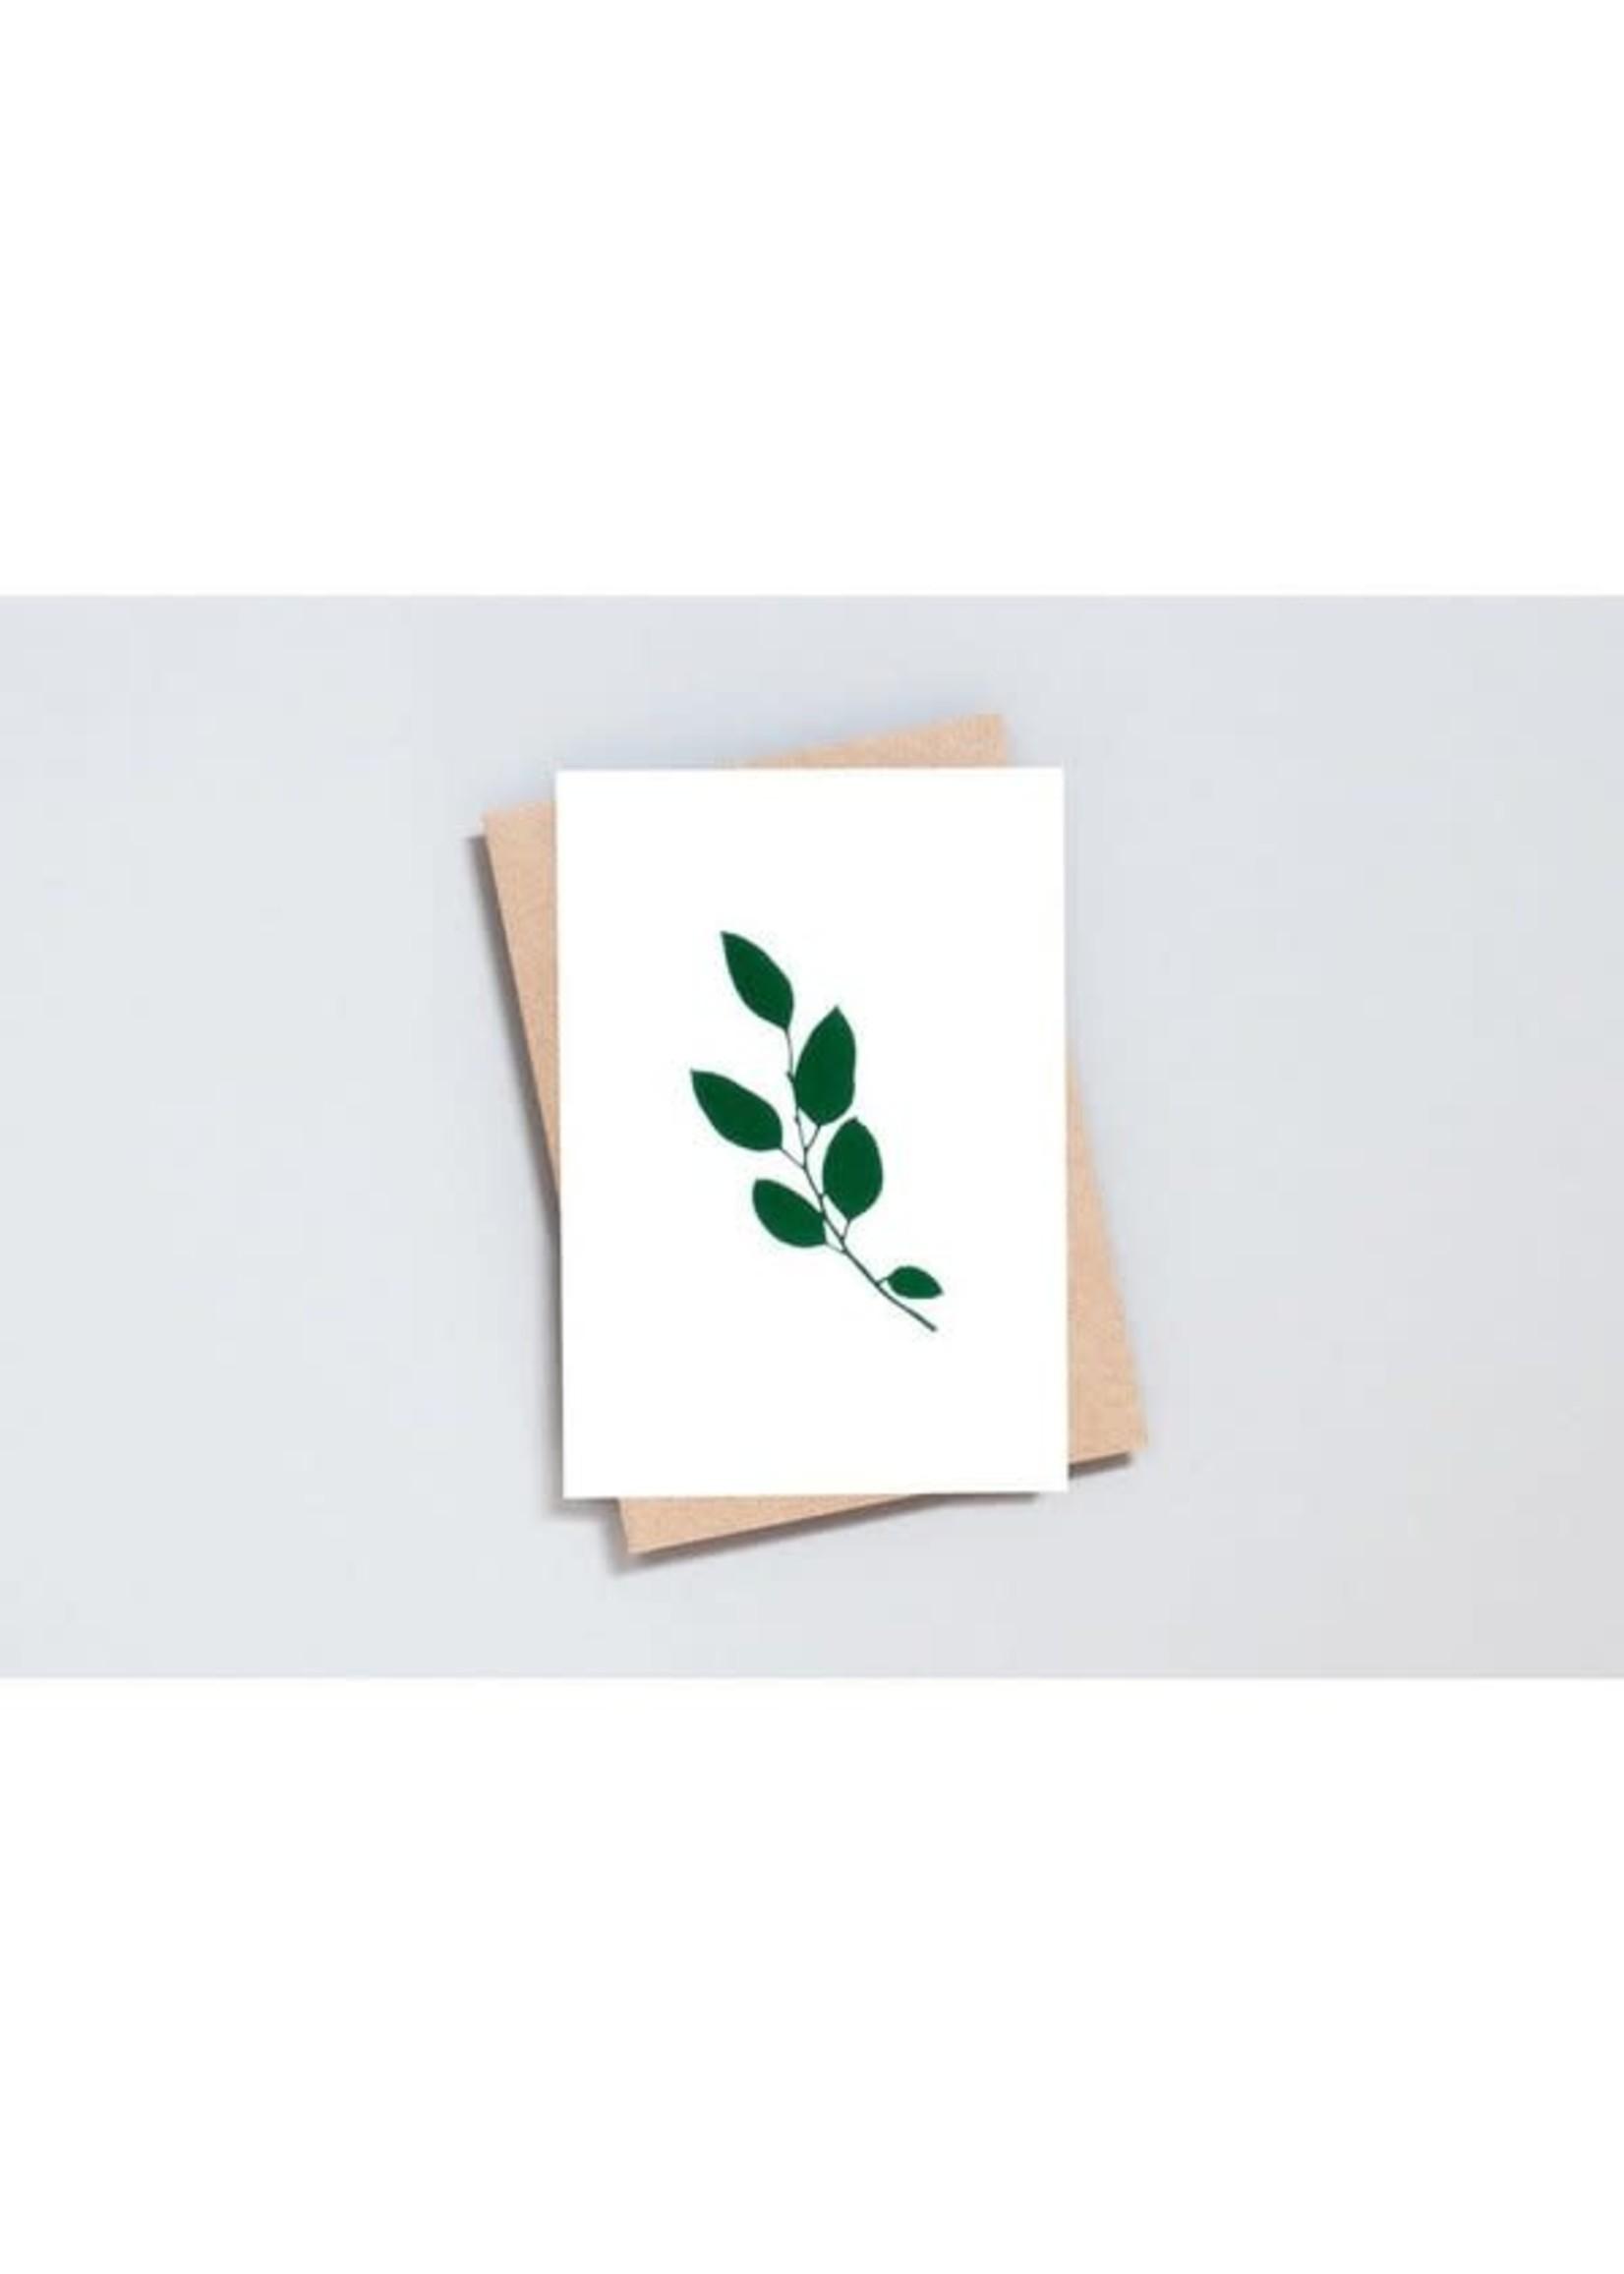 Ola Ola Foil Blocked Card Botanical Collection - Eucalyptus Print in Ivory/Green